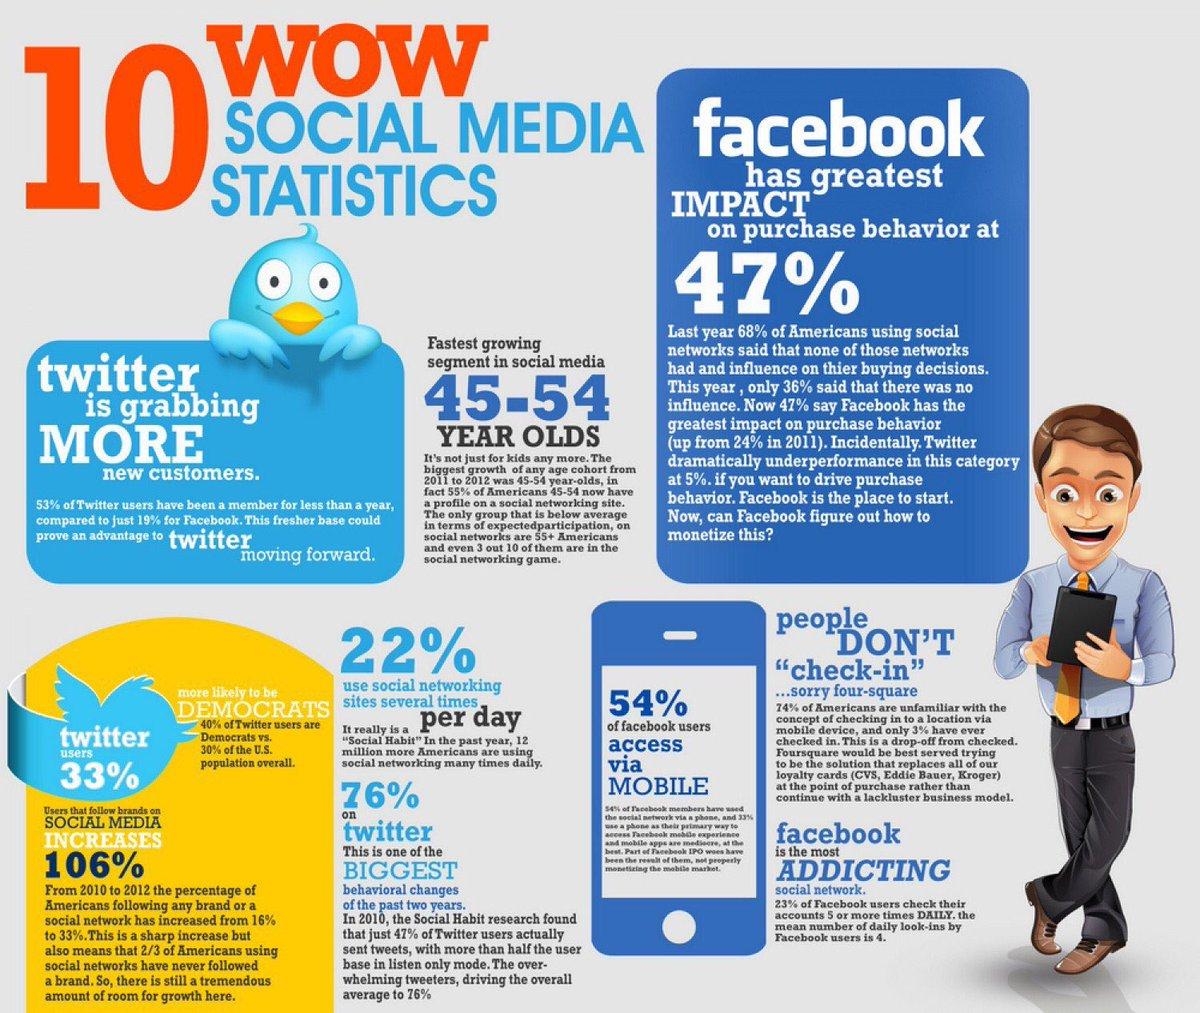 Interesting Social Media Stats!  #Makeyourownlane #Defstar5 #Mgvip #Innovation #SMM #DigitalMarketing #GrowthHacking #Marketing #Branding #Abhiseo <br>http://pic.twitter.com/SIorCSJjDu